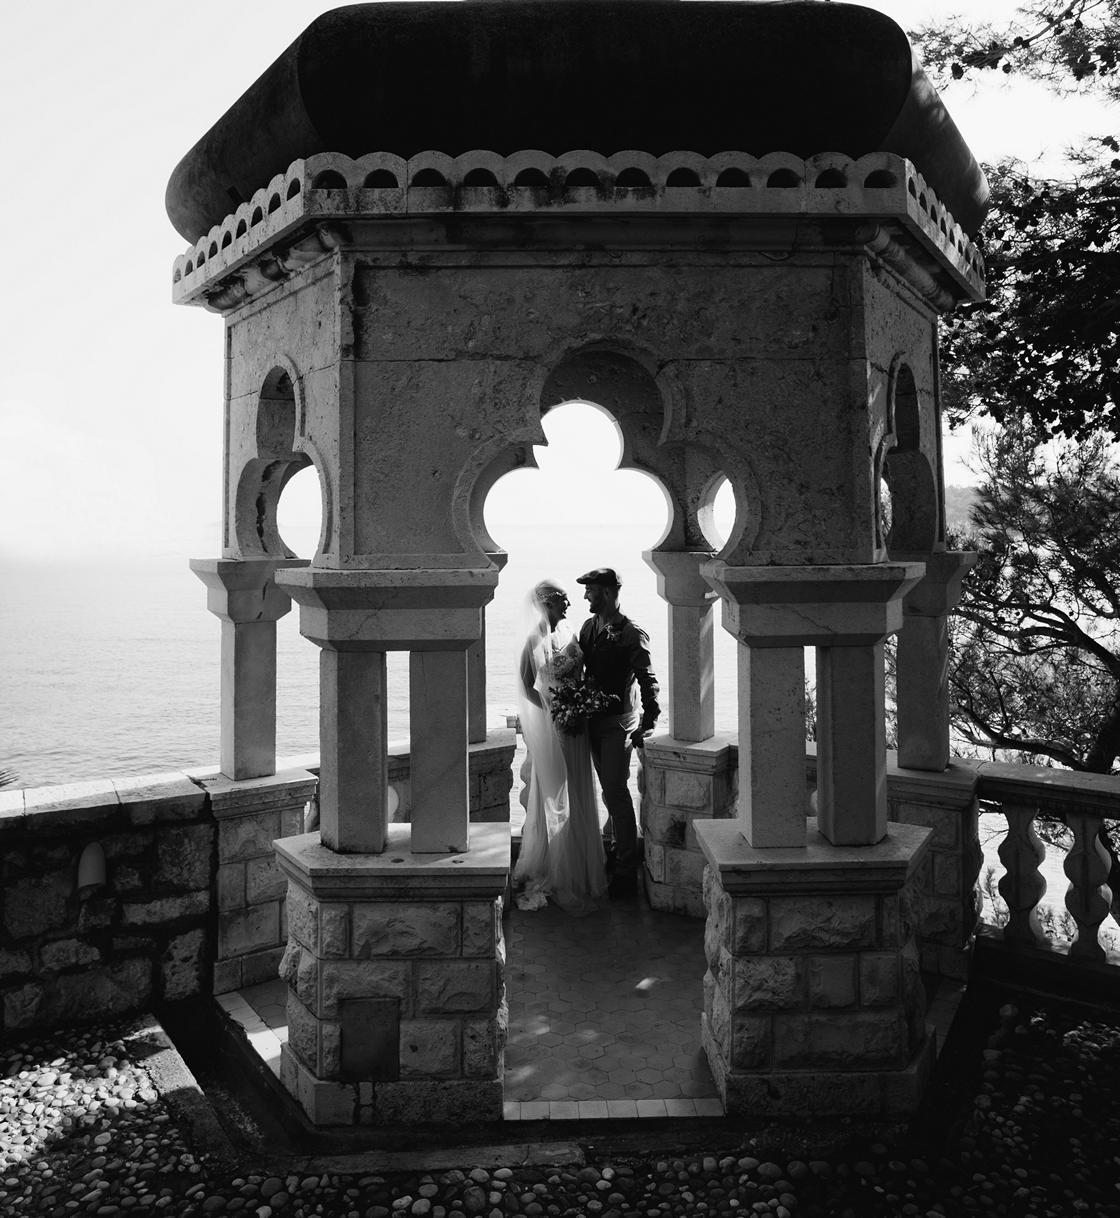 dubrovnik-wedding-photographer-croatia-destination-weddings-jenna-rich030